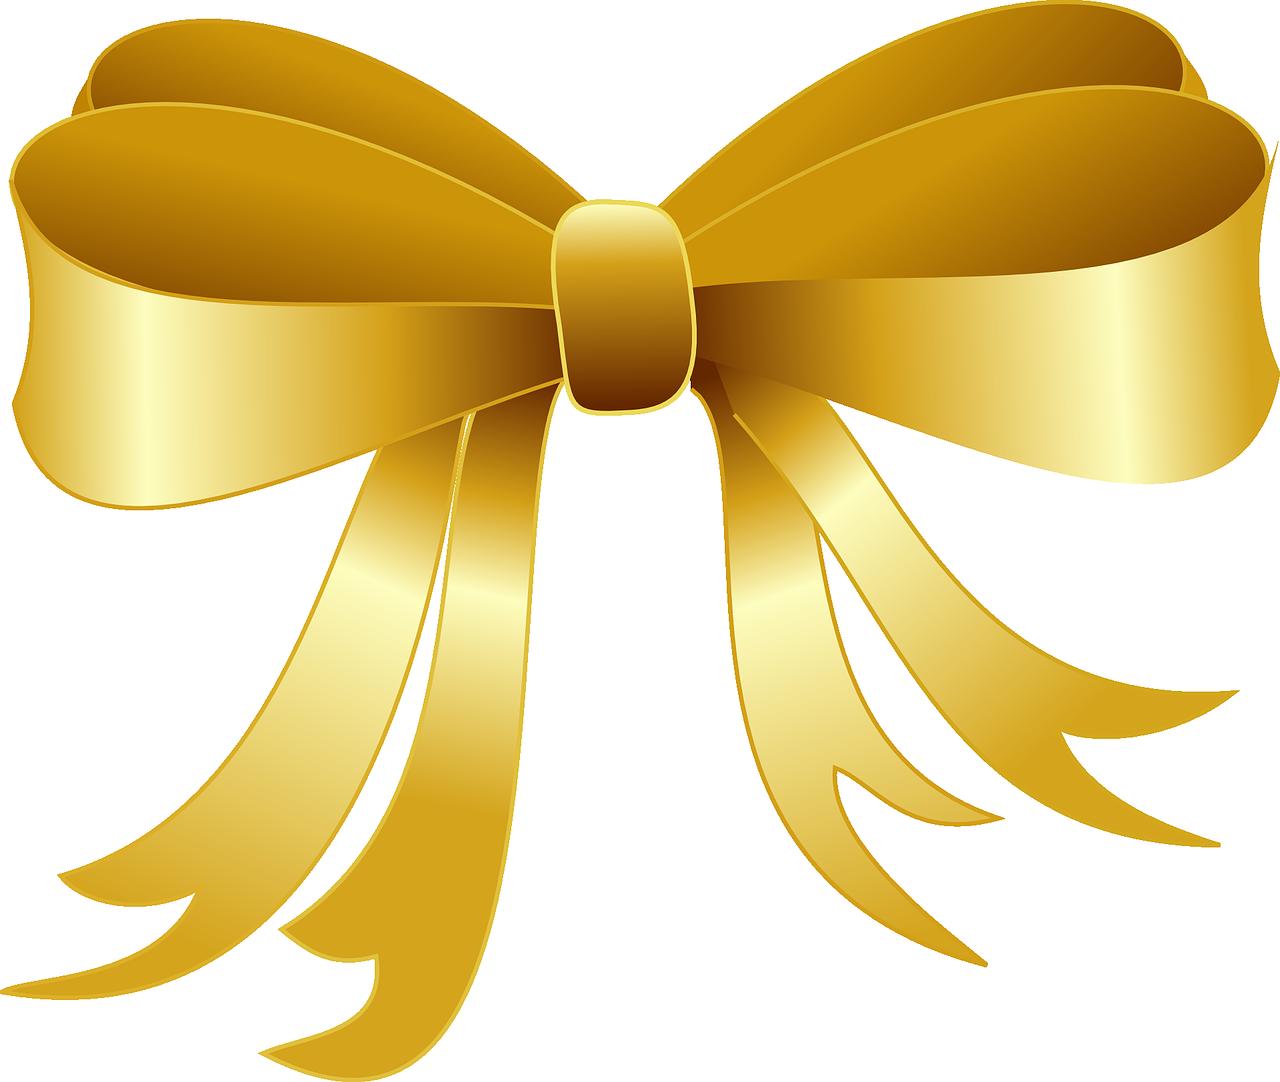 Golden Ribbon PNG Image